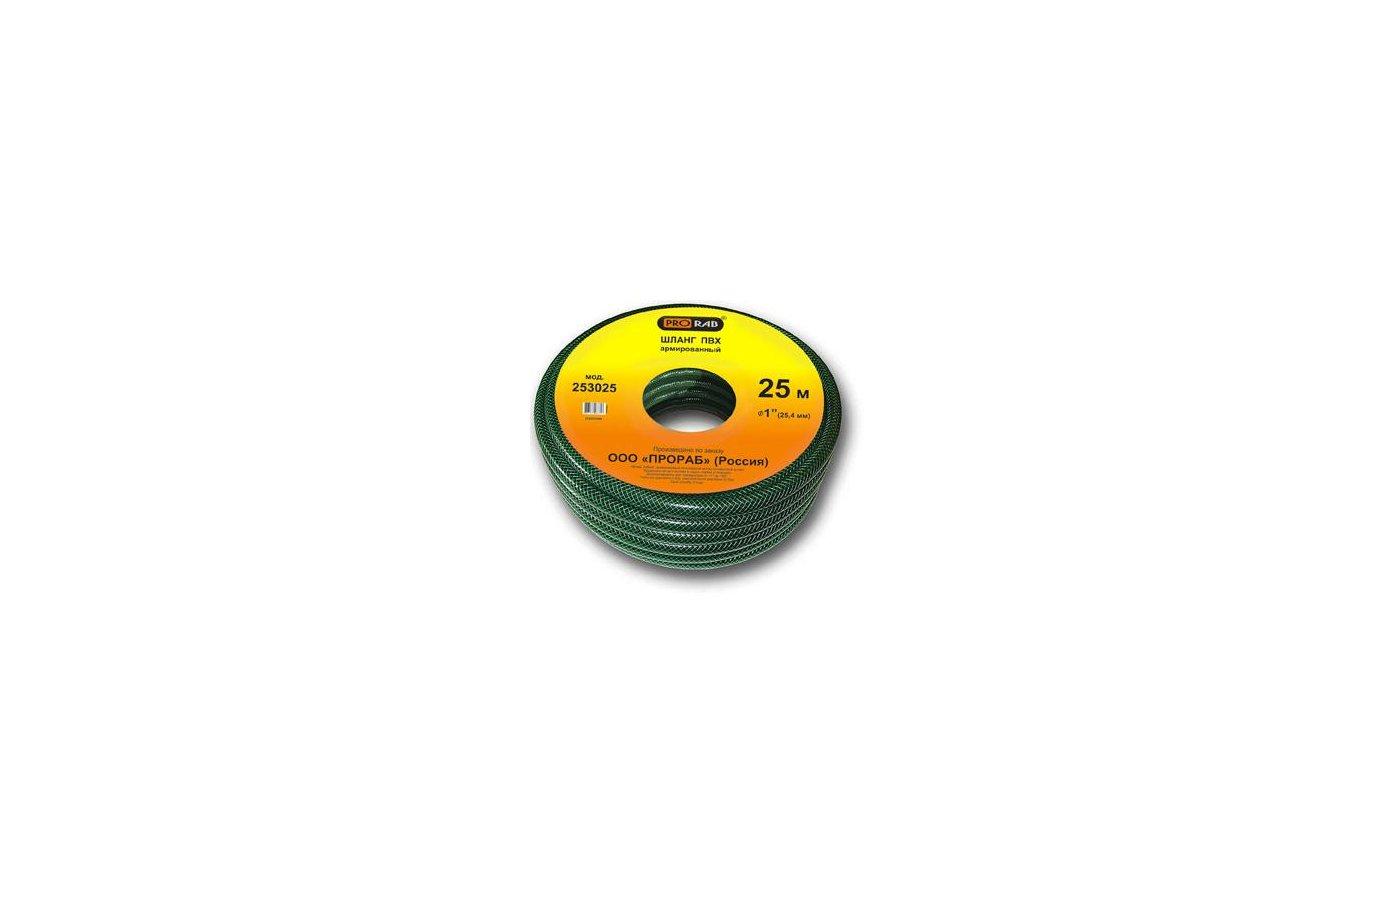 "Поливочное оборудование Prorab 253025   Шланг ПВХ для полива, диаметр  1"", 25 м  Hobby"